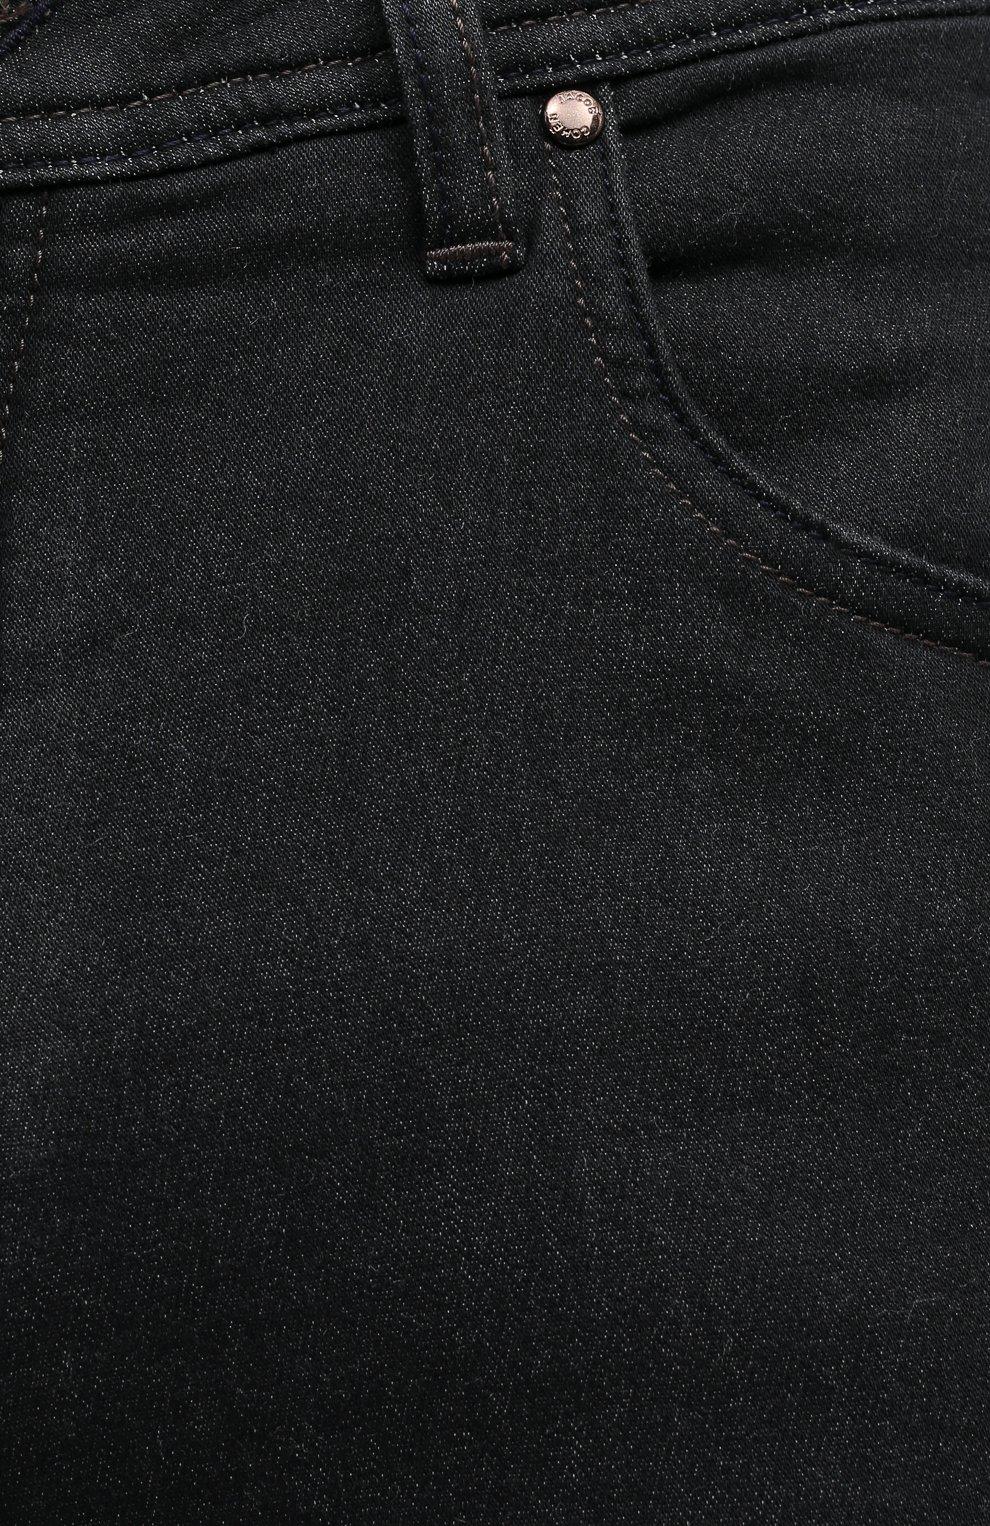 Мужские джинсы JACOB COHEN черного цвета, арт. J622 C0MF 02042-W1/54 | Фото 5